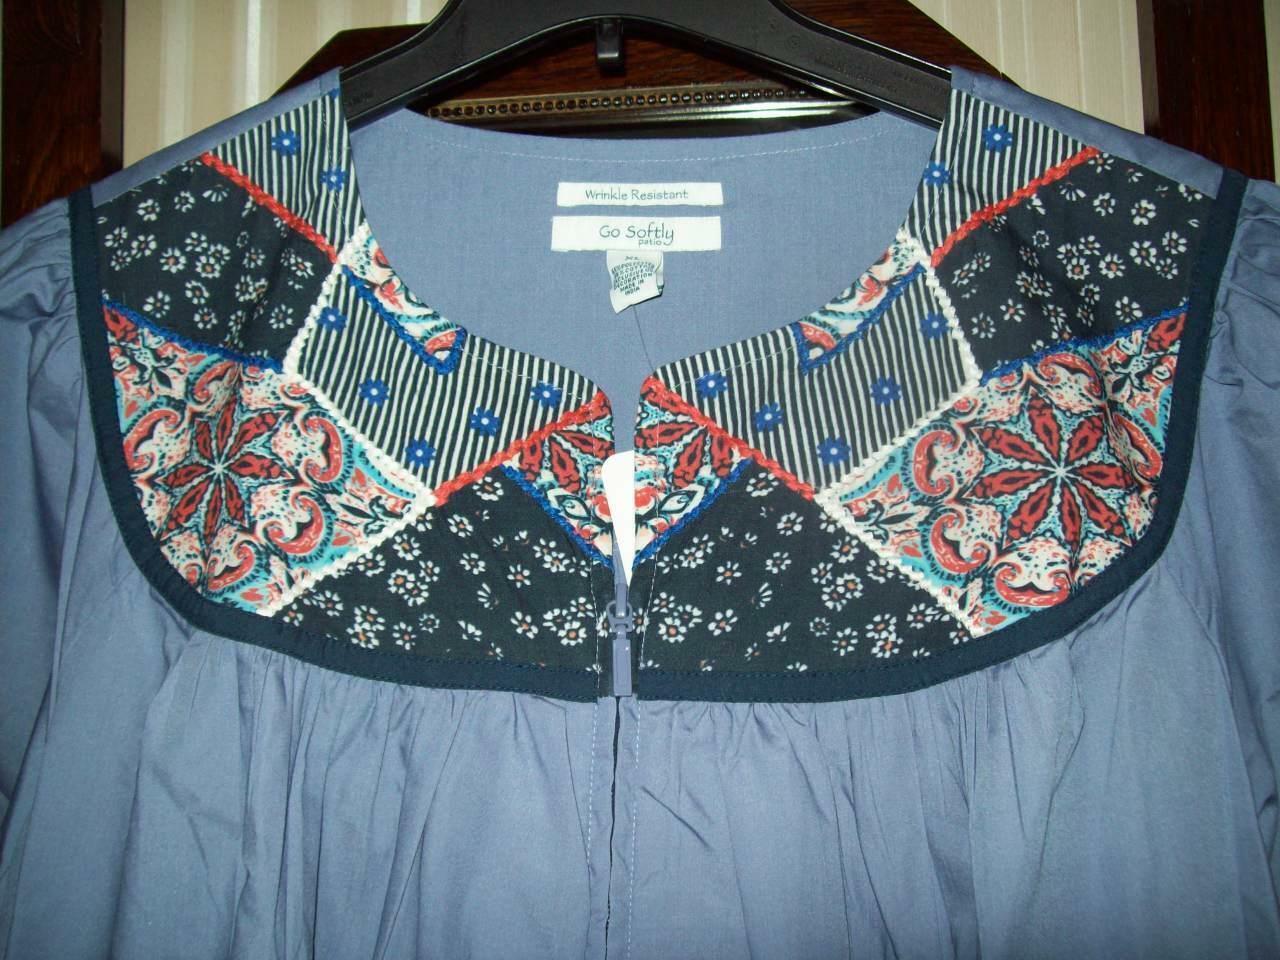 NWT GO SOFTLY WRINKLE RESIST POPLIN ZIP PATIO MUU DUSTER DRESS PATCHWORK Blau